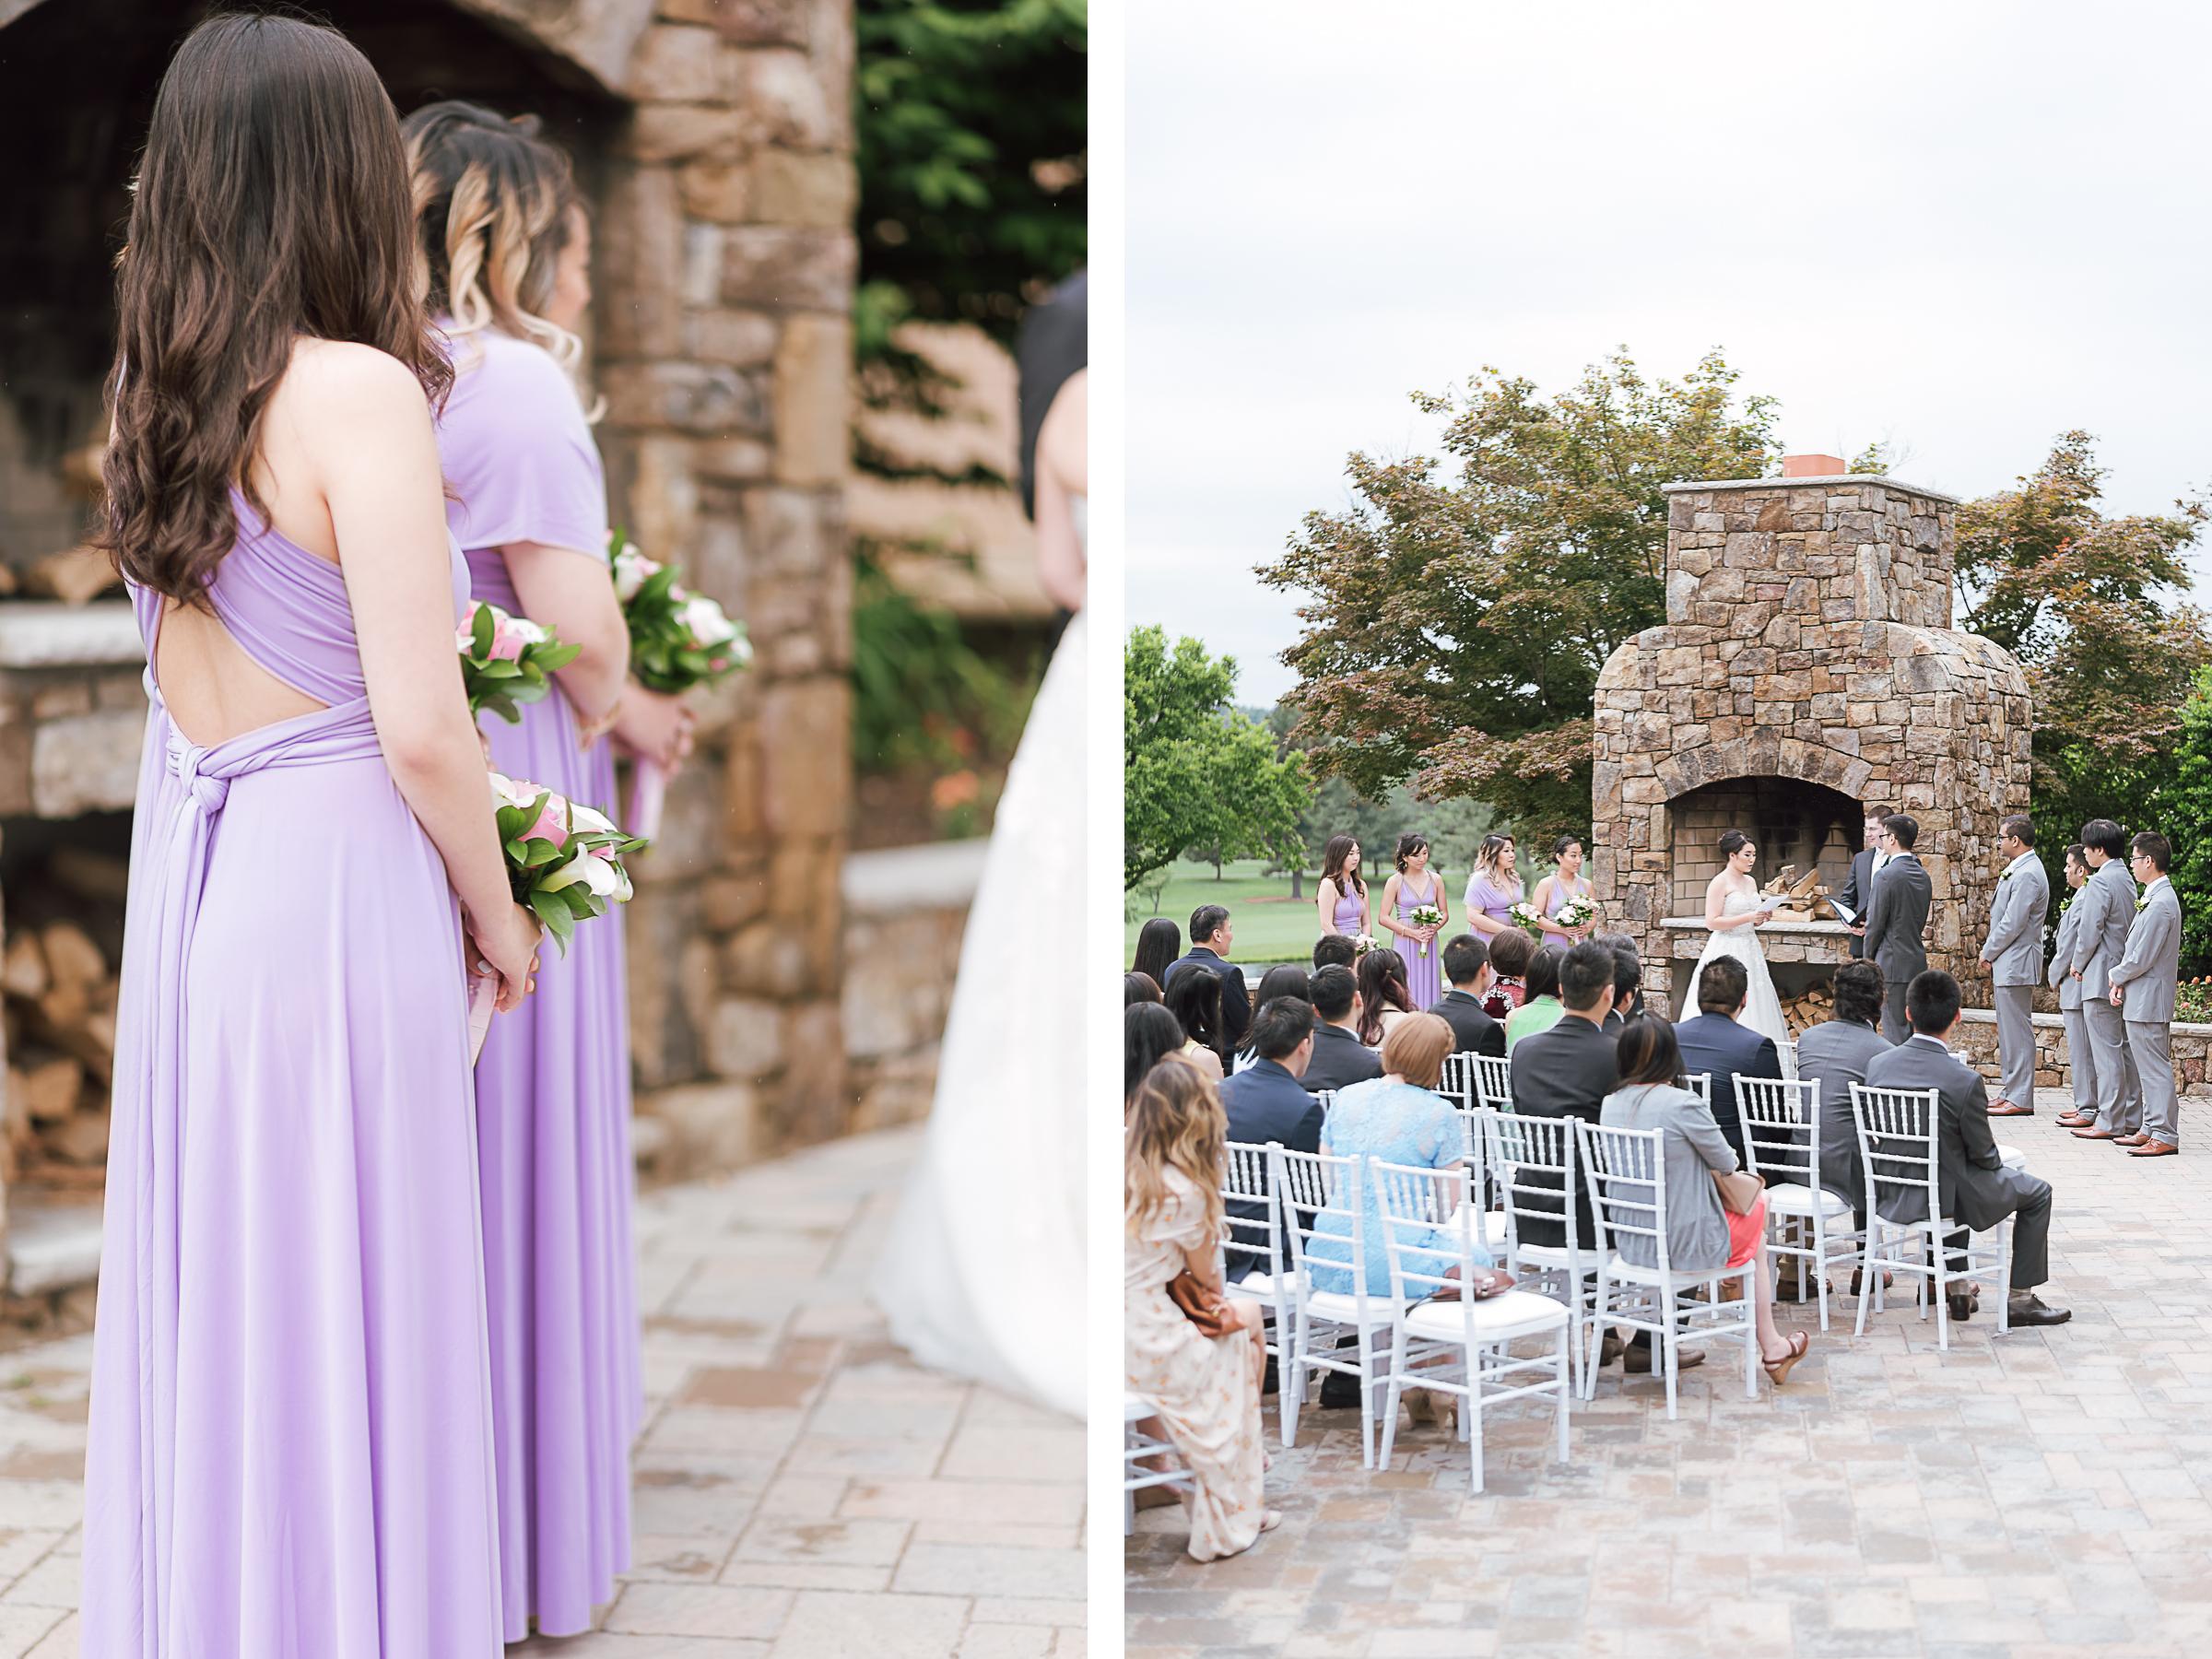 MD-Wedding-Bretton-Woods-Ceremony.jpg